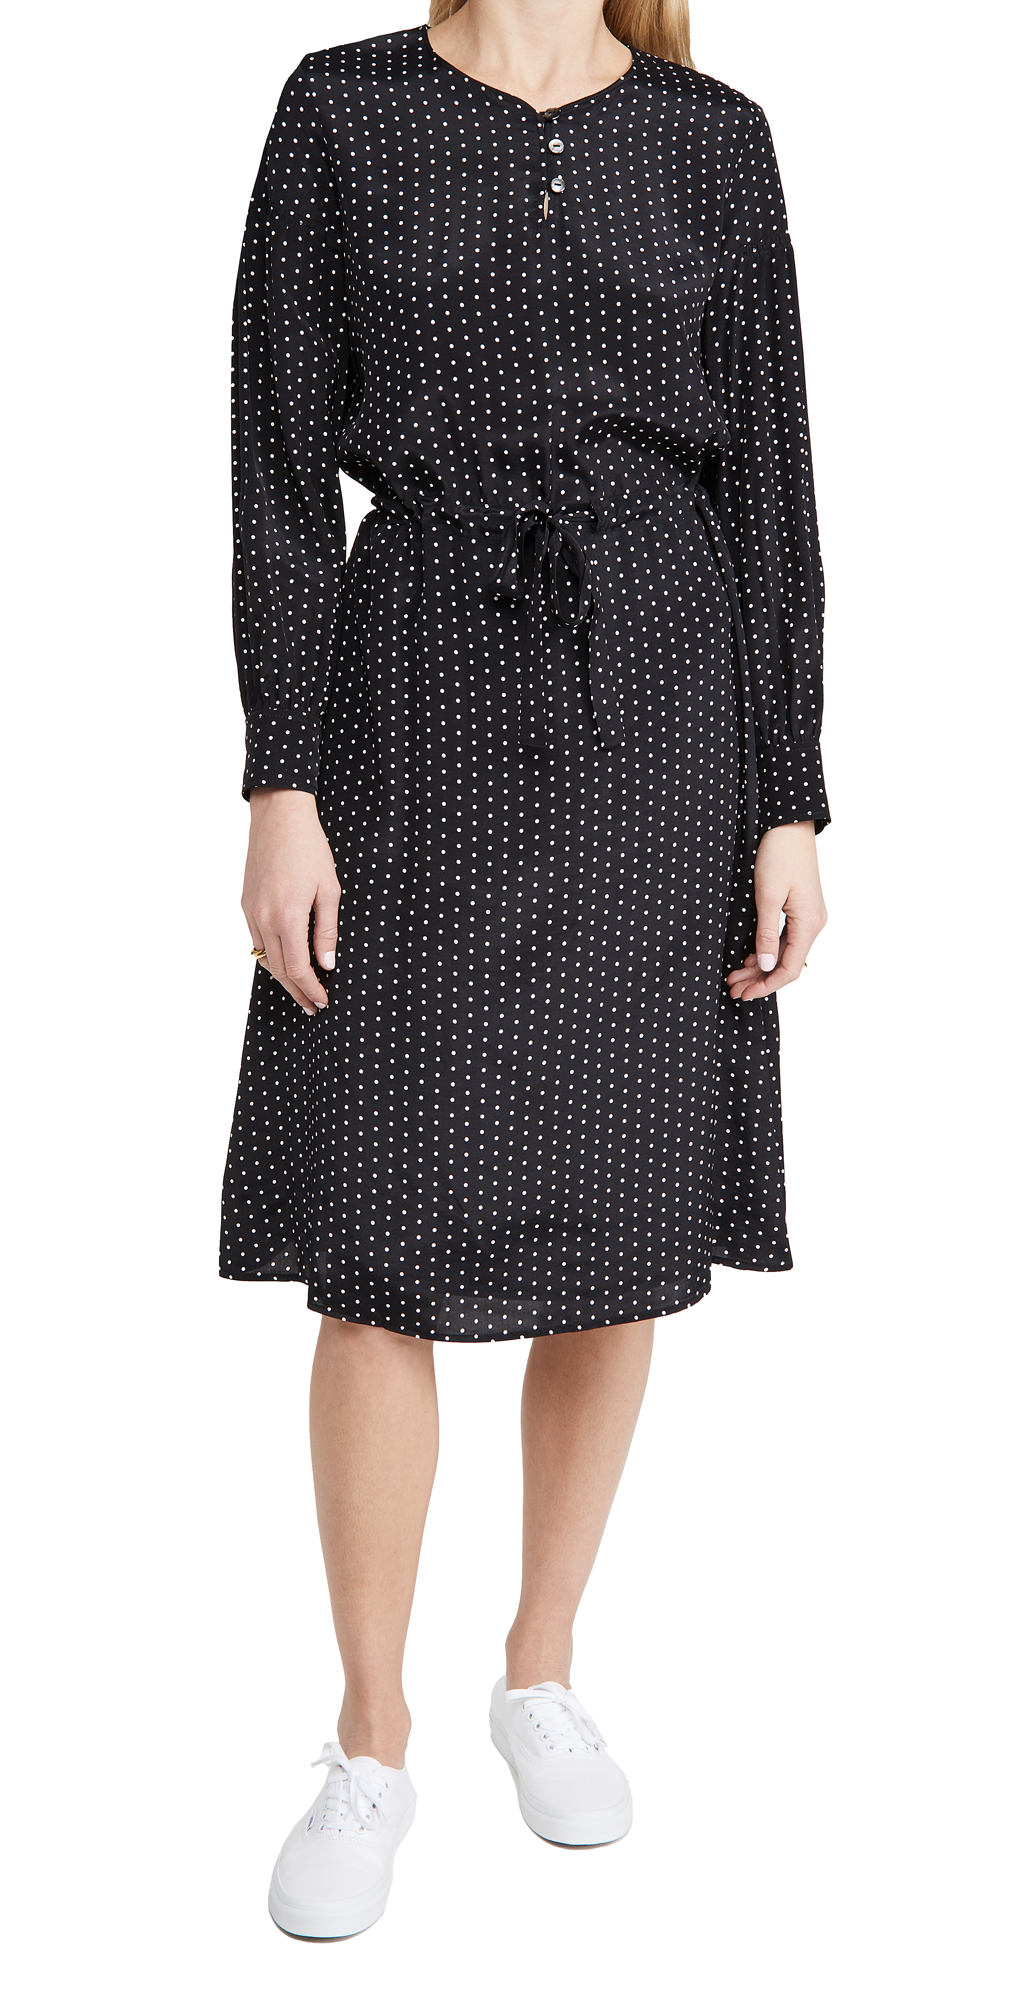 A.P.C. Clemence Dress